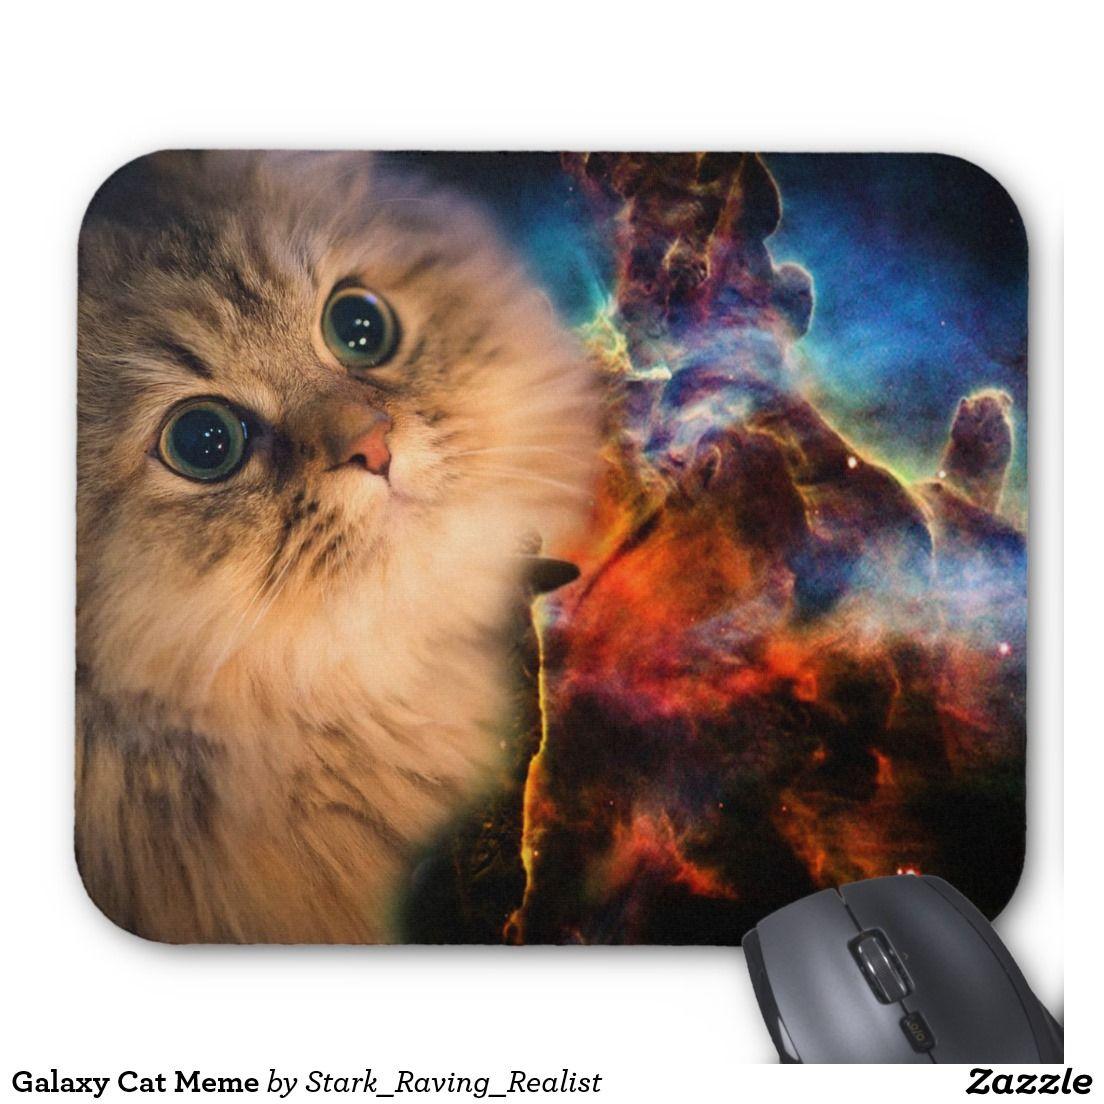 Galaxy Cat Meme Mouse Pad Cat Wallpaper Cat Images Hd Space Cat